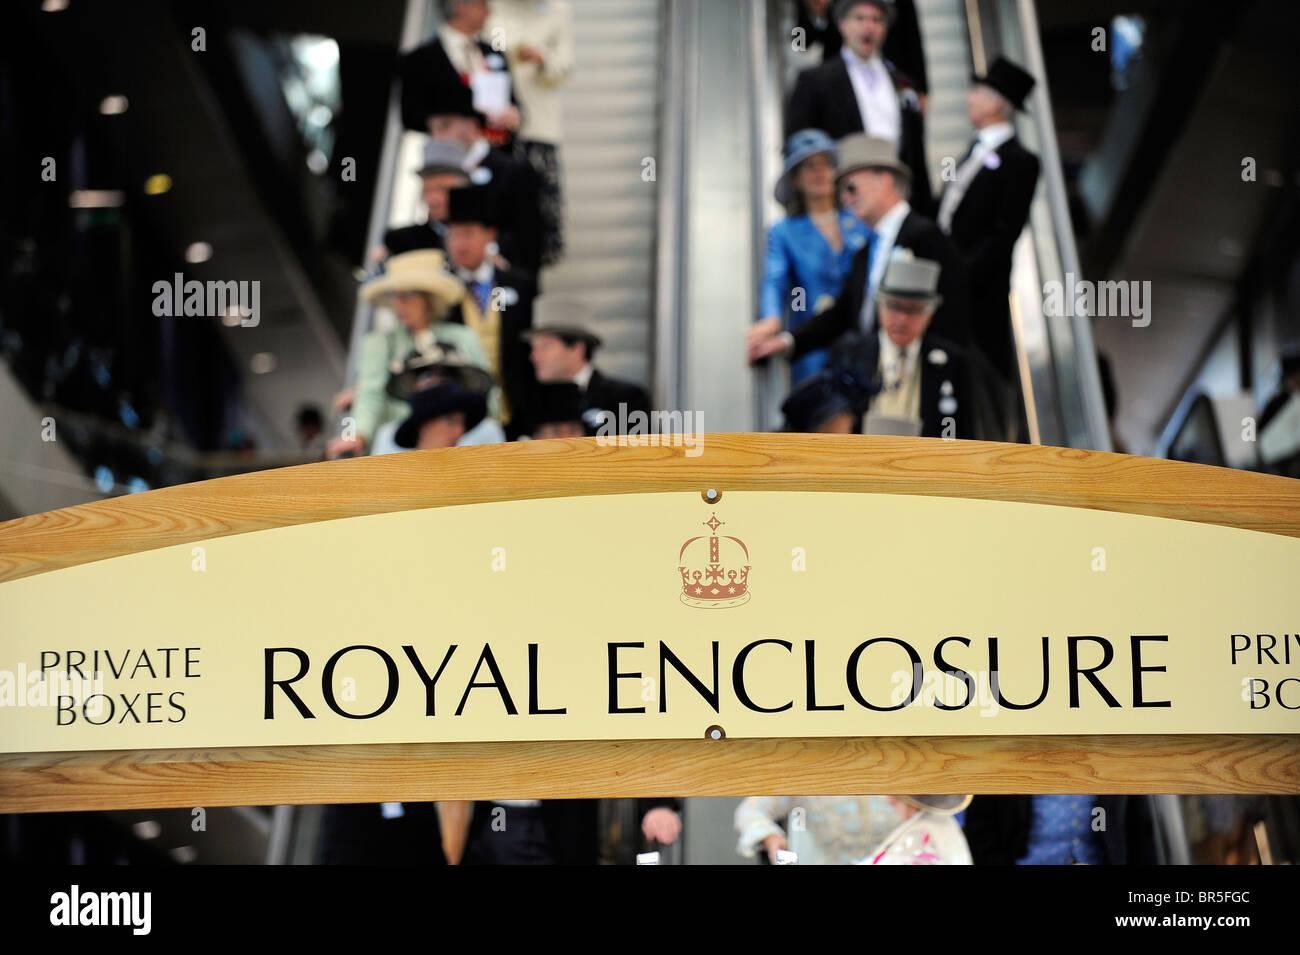 Royal Enclosure sign during day one of Royal Ascot  - Stock Image